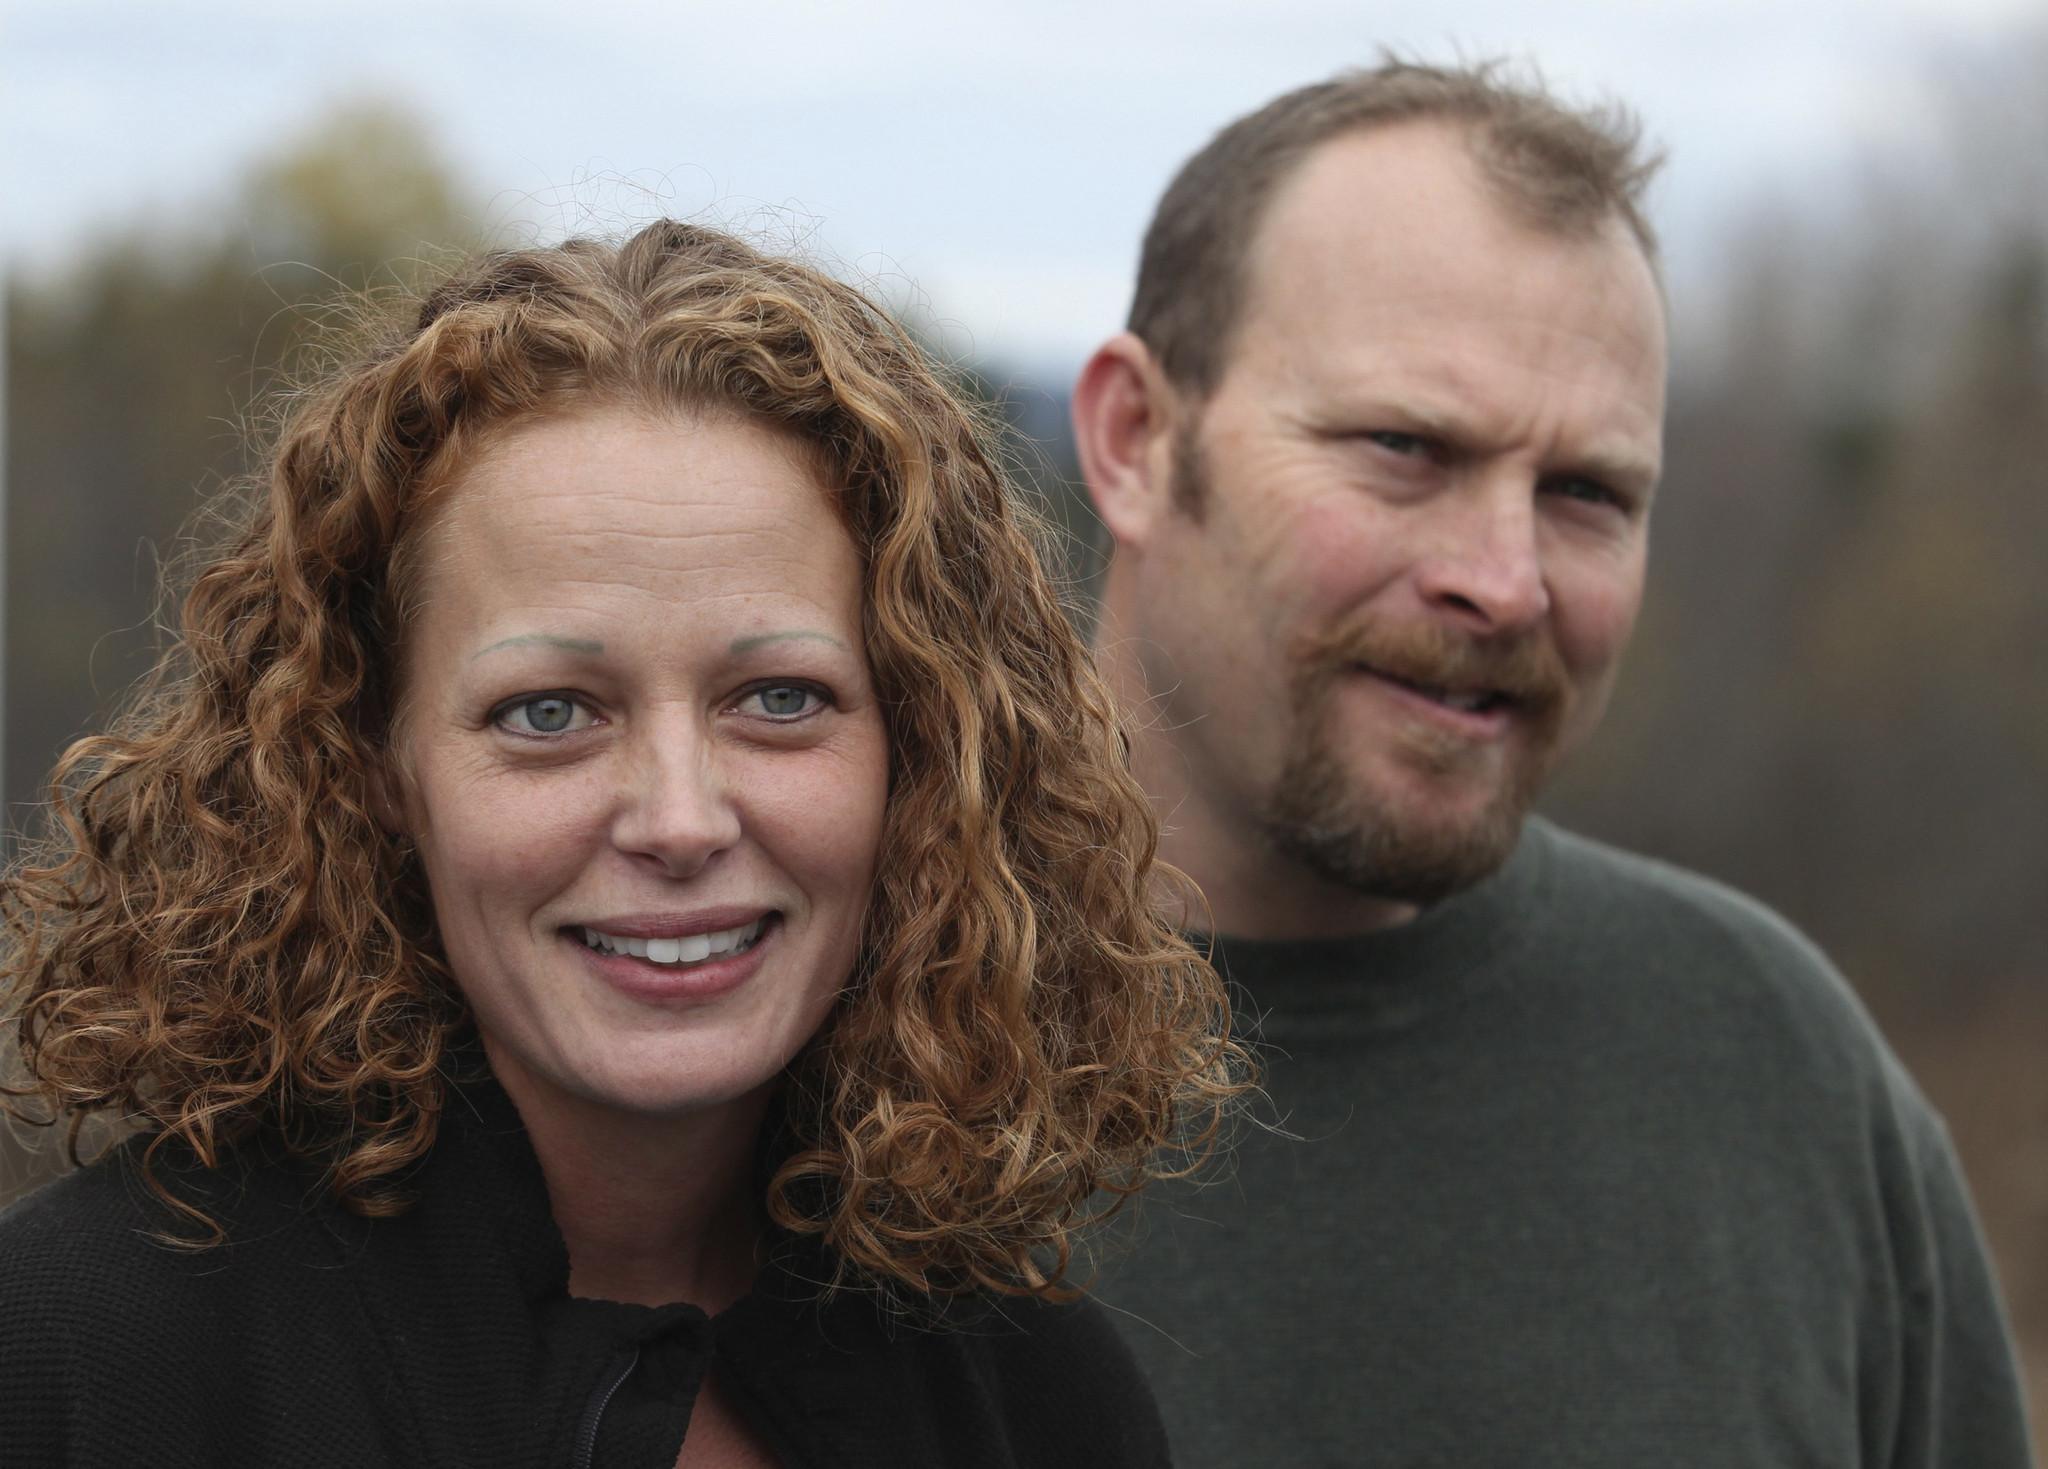 Nurse who fought Ebola quarantine moving out of Maine: report